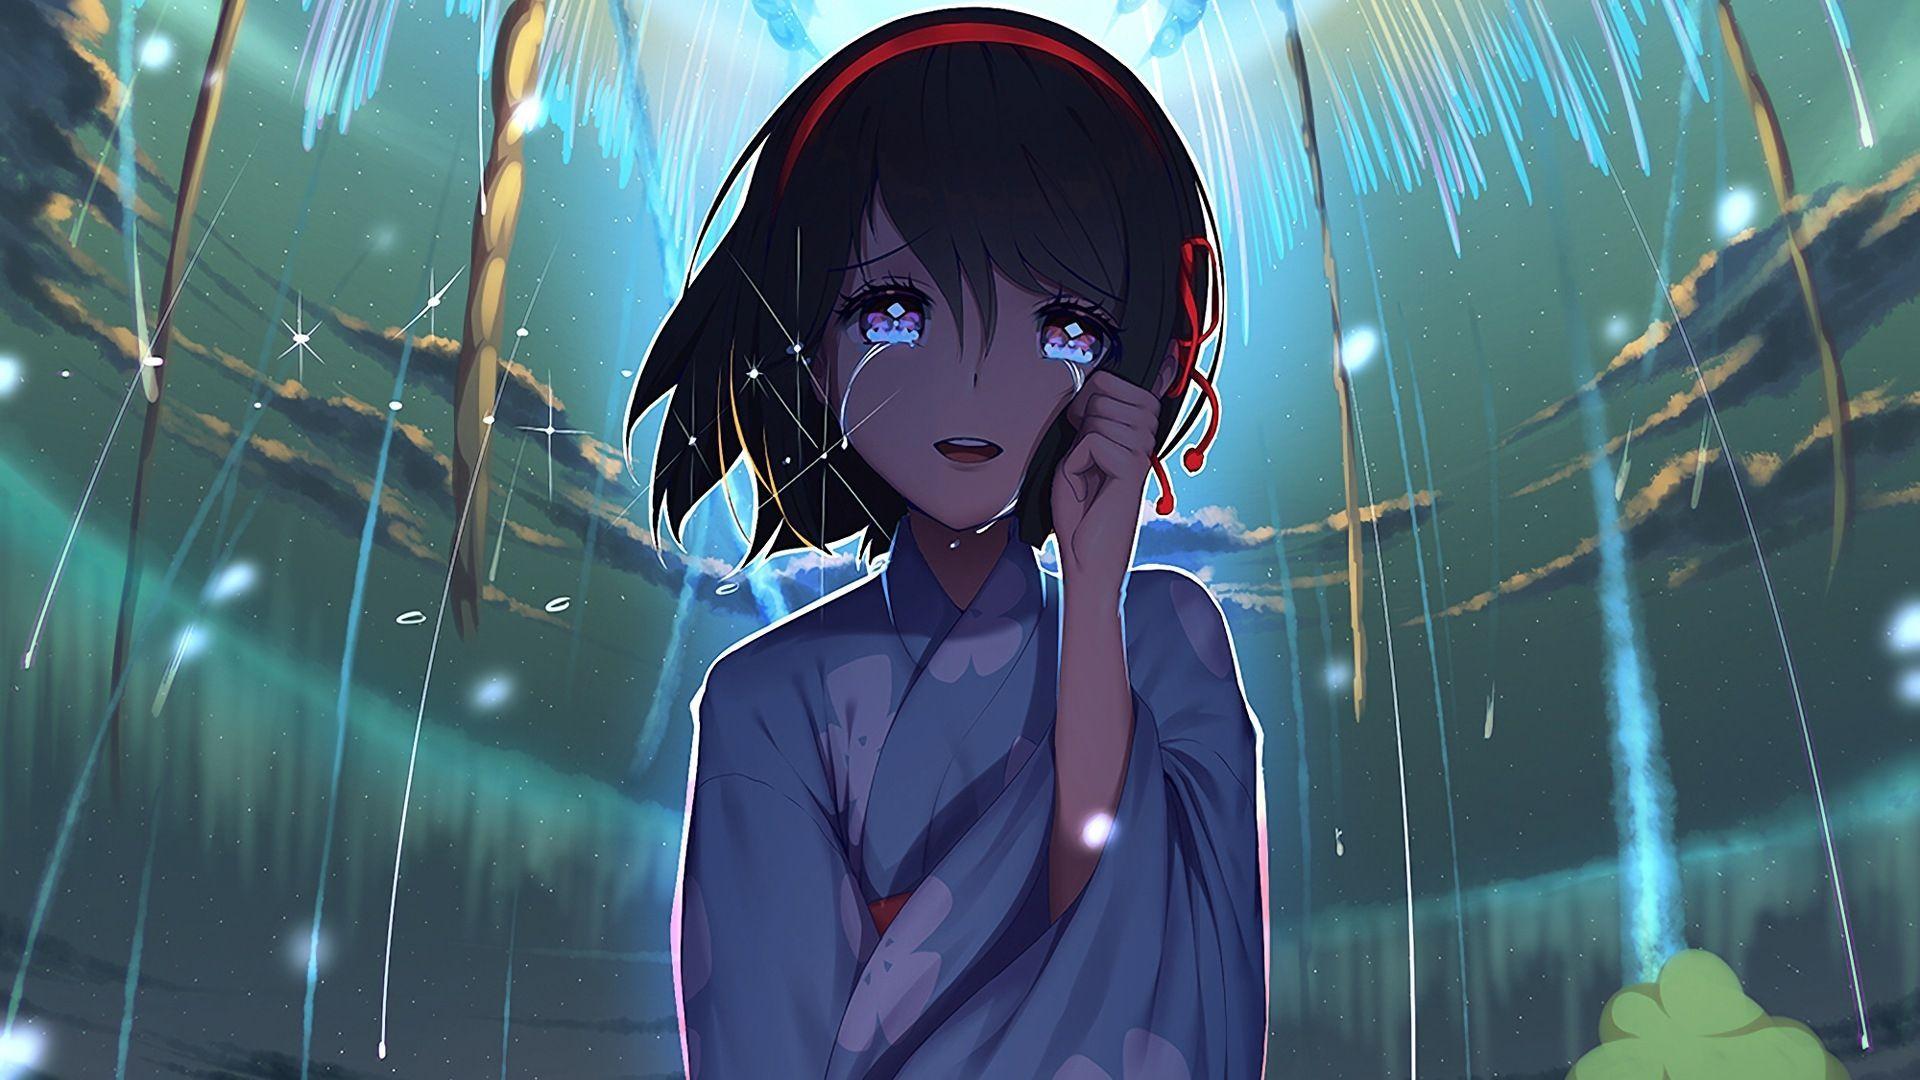 Sad Girls Anime Wallpapers - Wallpaper Cave